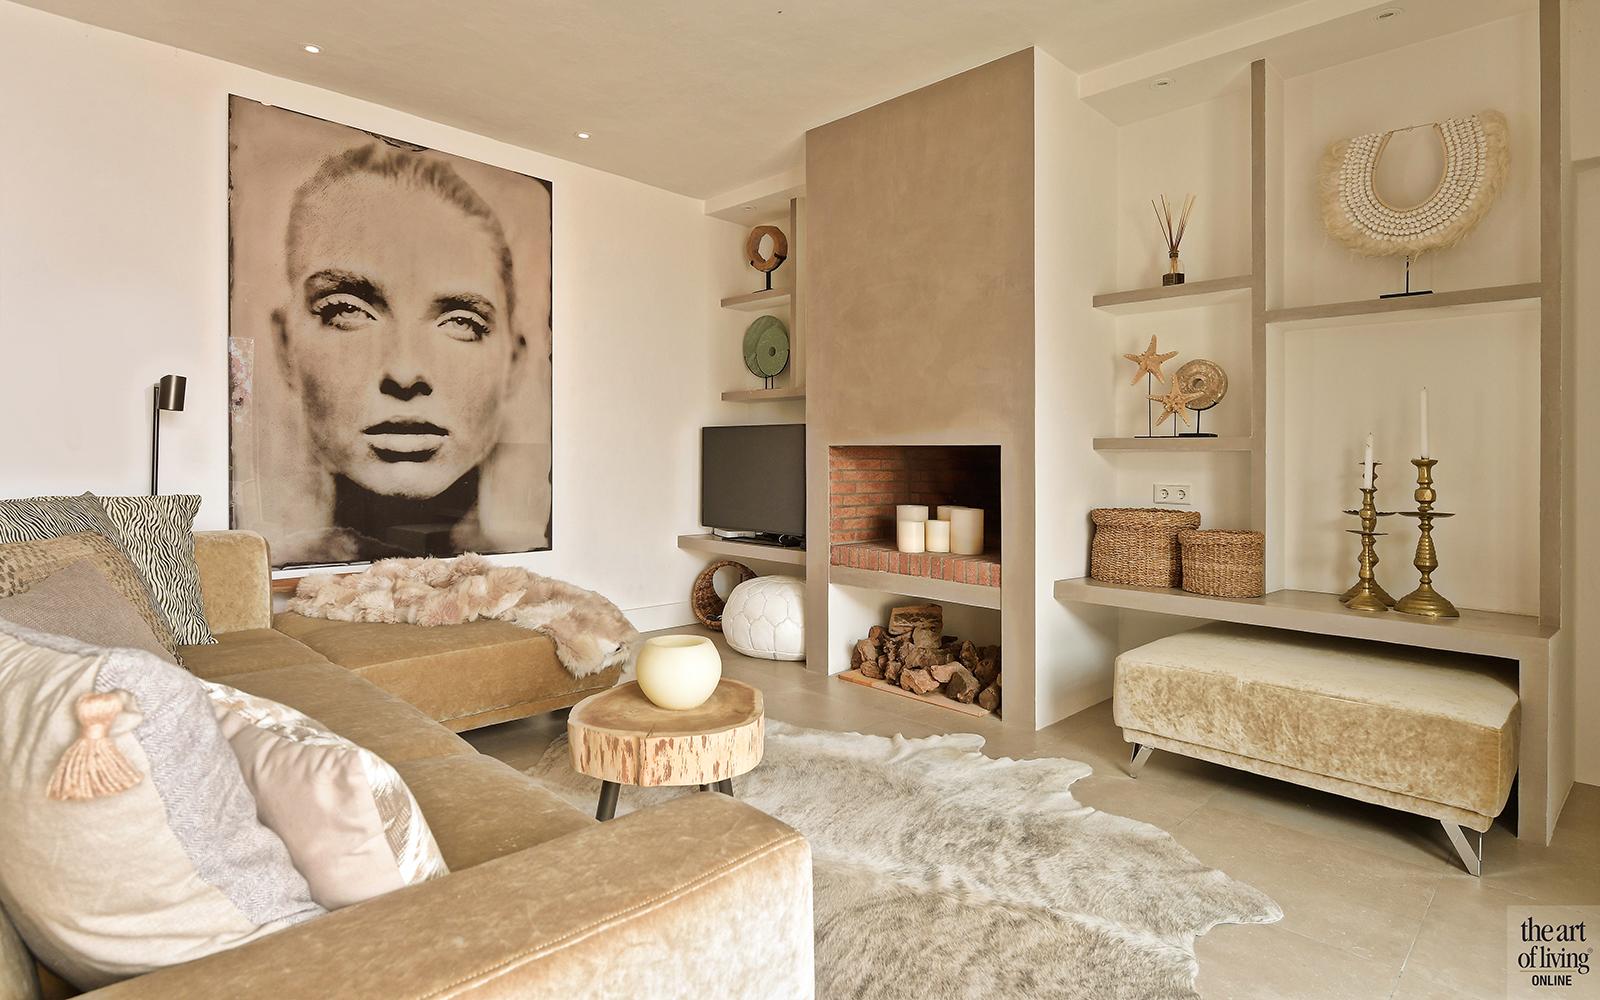 Kleur in je interieur, Woontrend 2019, Woontrend, Kleuraccent, Accentkleur, Gouden muur, Pastel interieur, Ibiza style